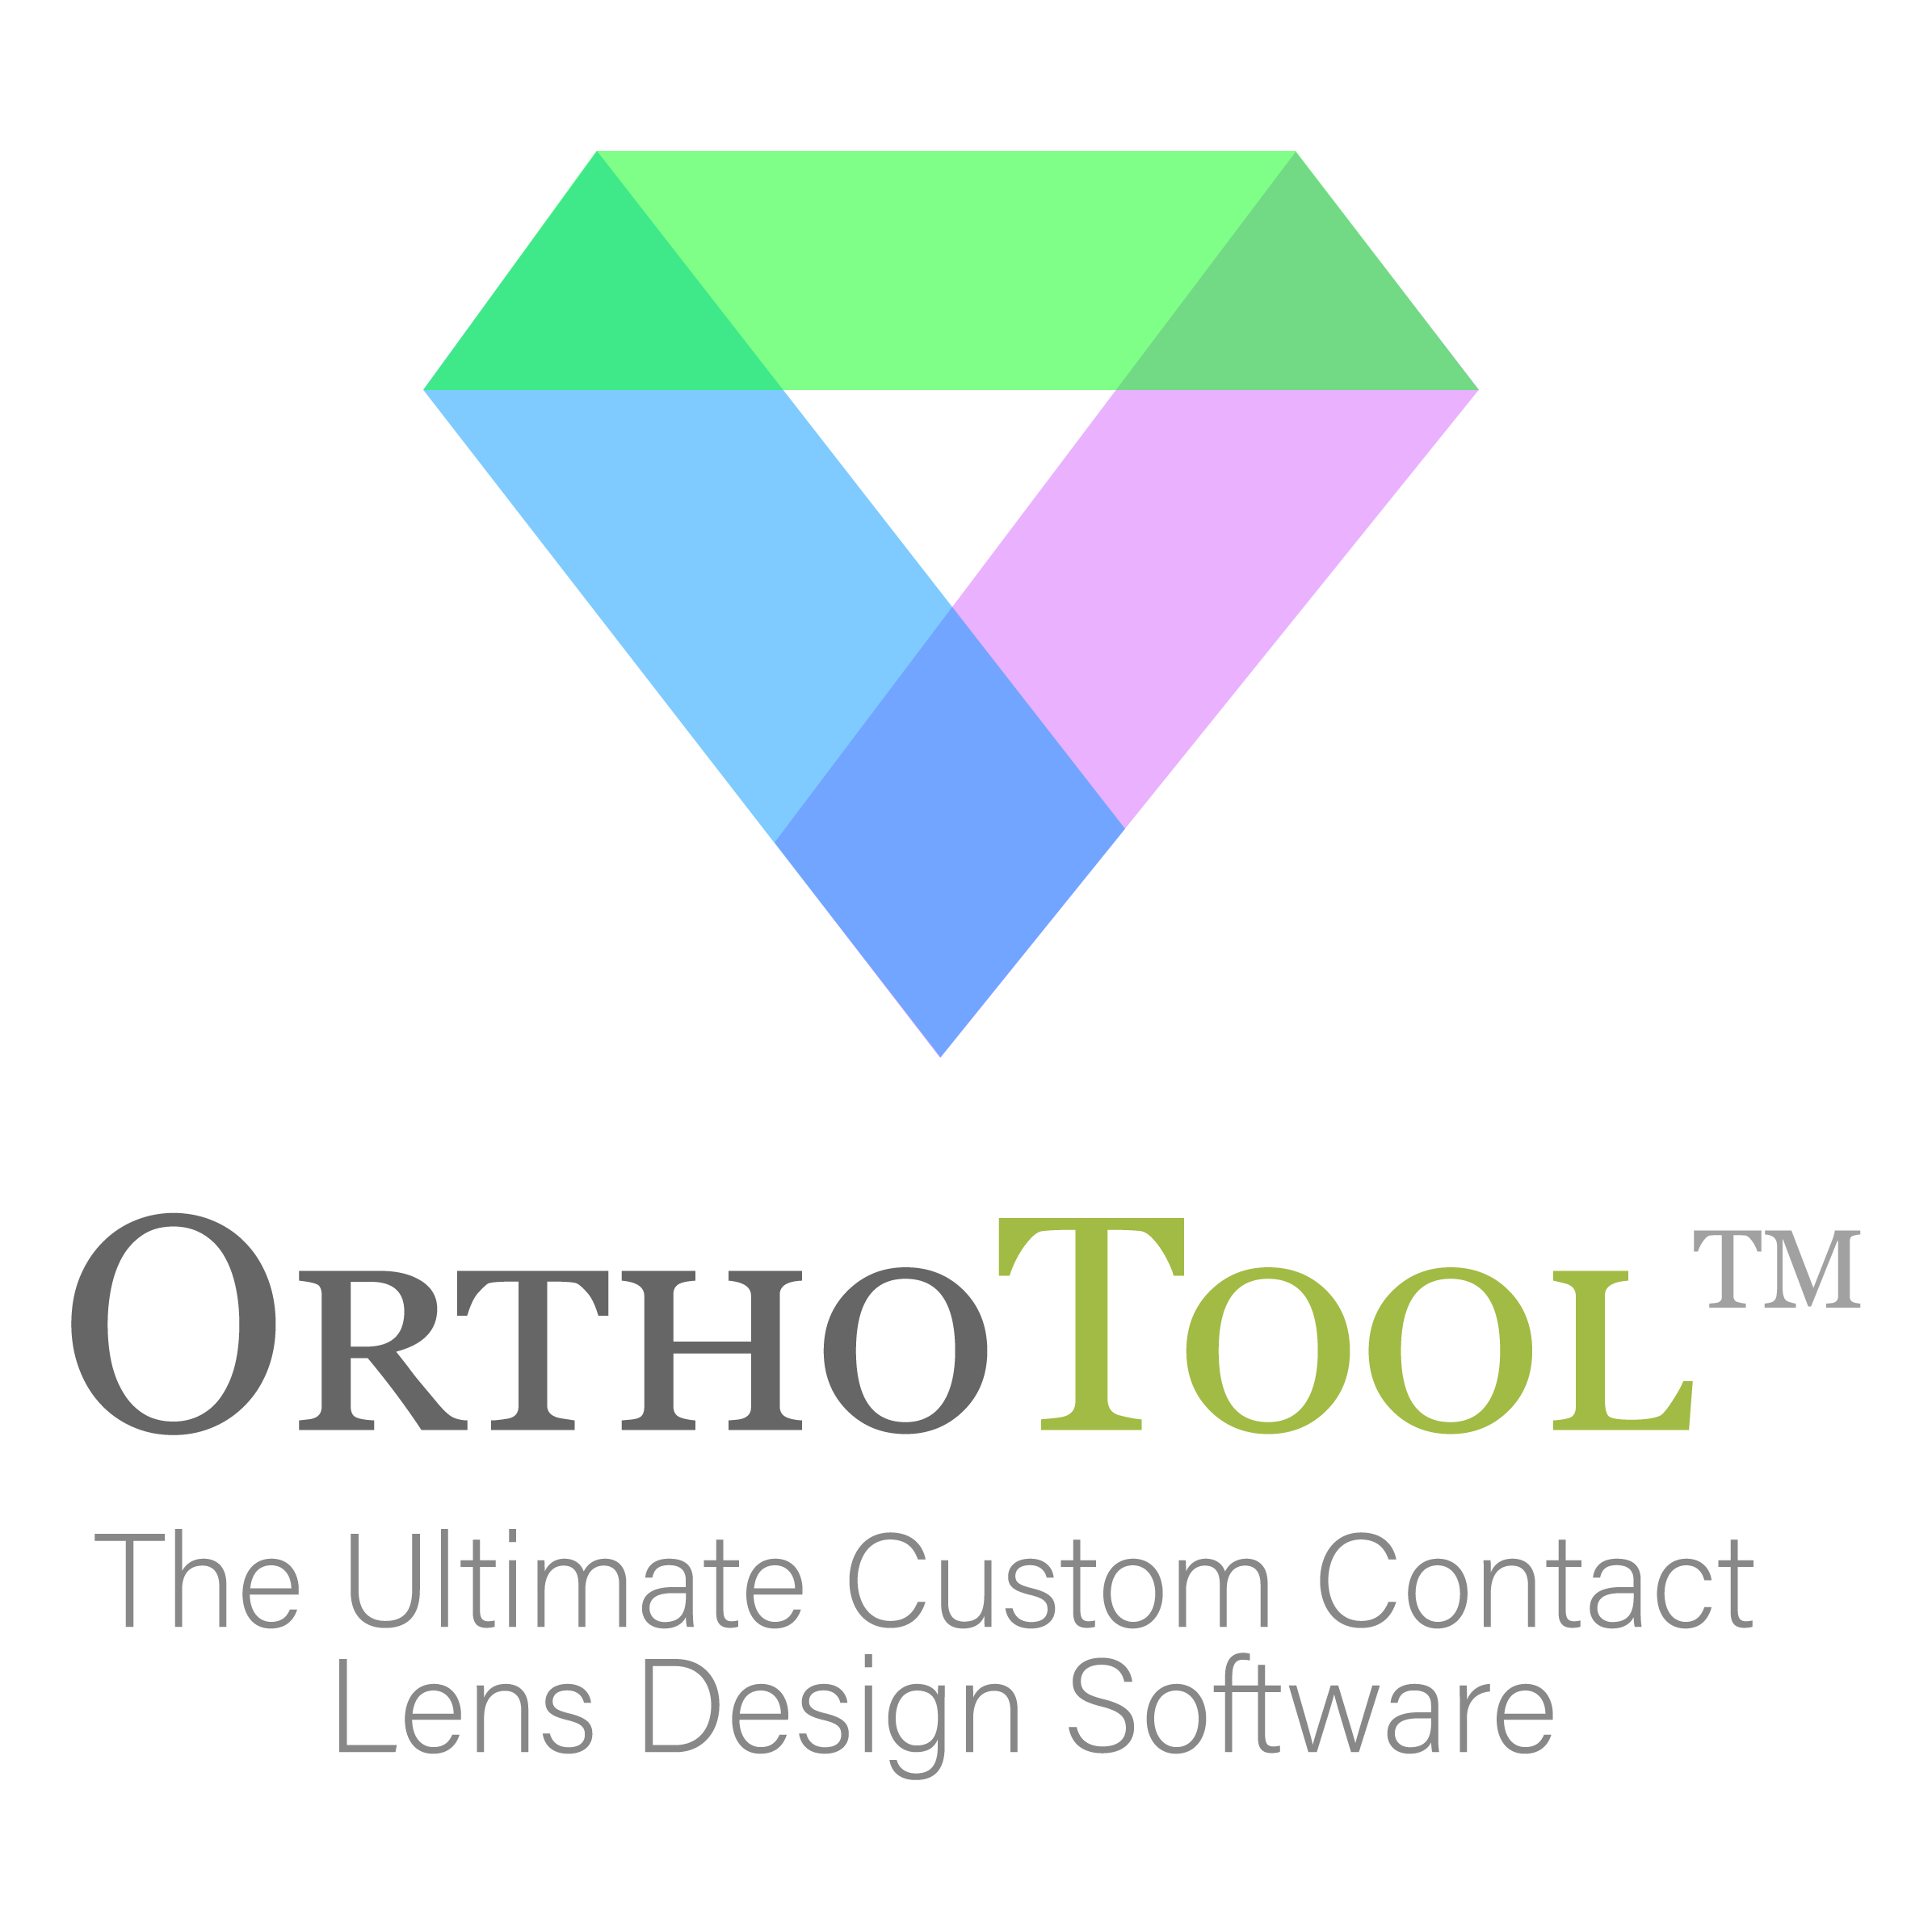 orthotool-logo-large-positive-tagline-1-0.png